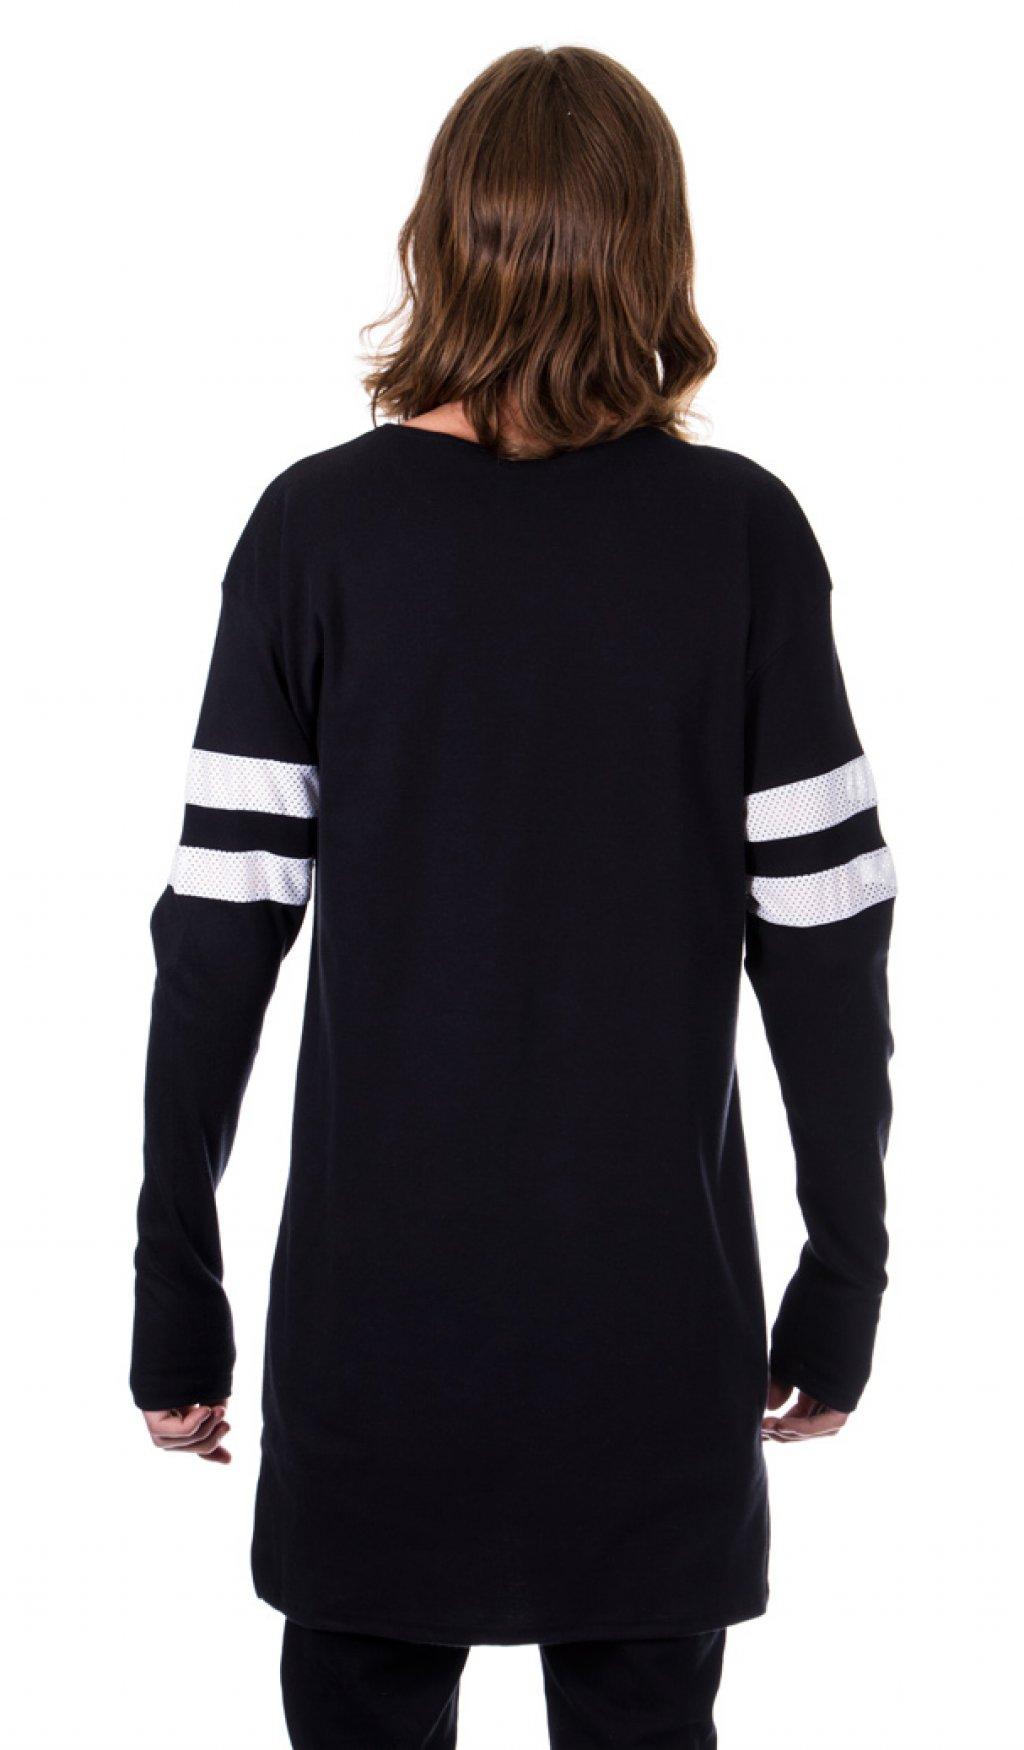 Black t shirt with white stripes - 2 Stripe Long Sleeve T Shirt Black